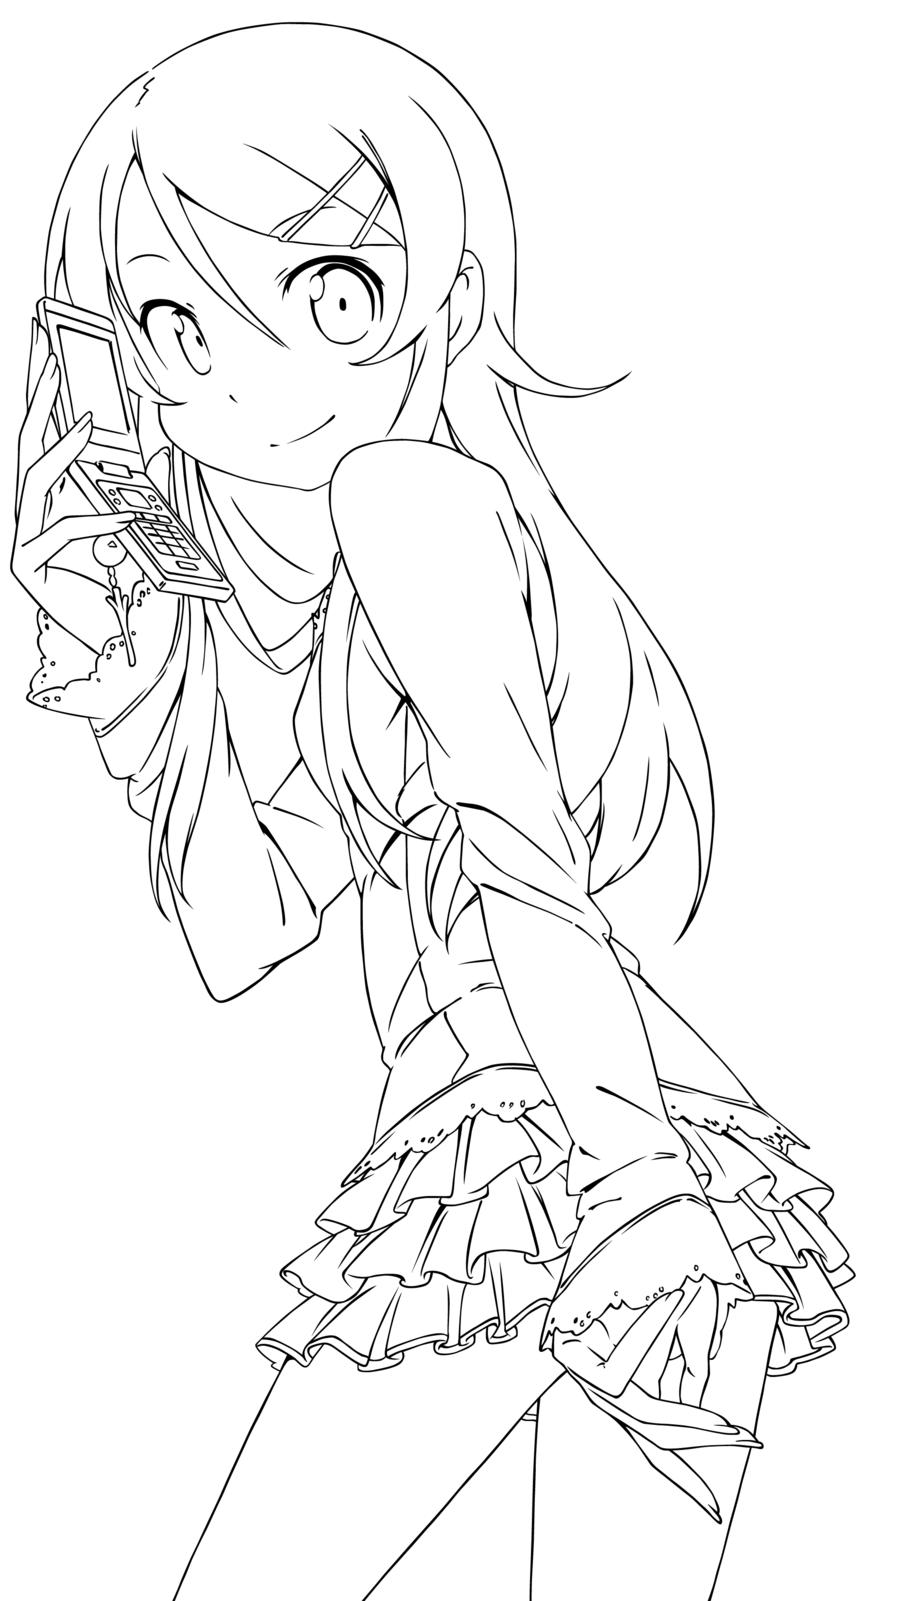 Pin On Anime Line Art